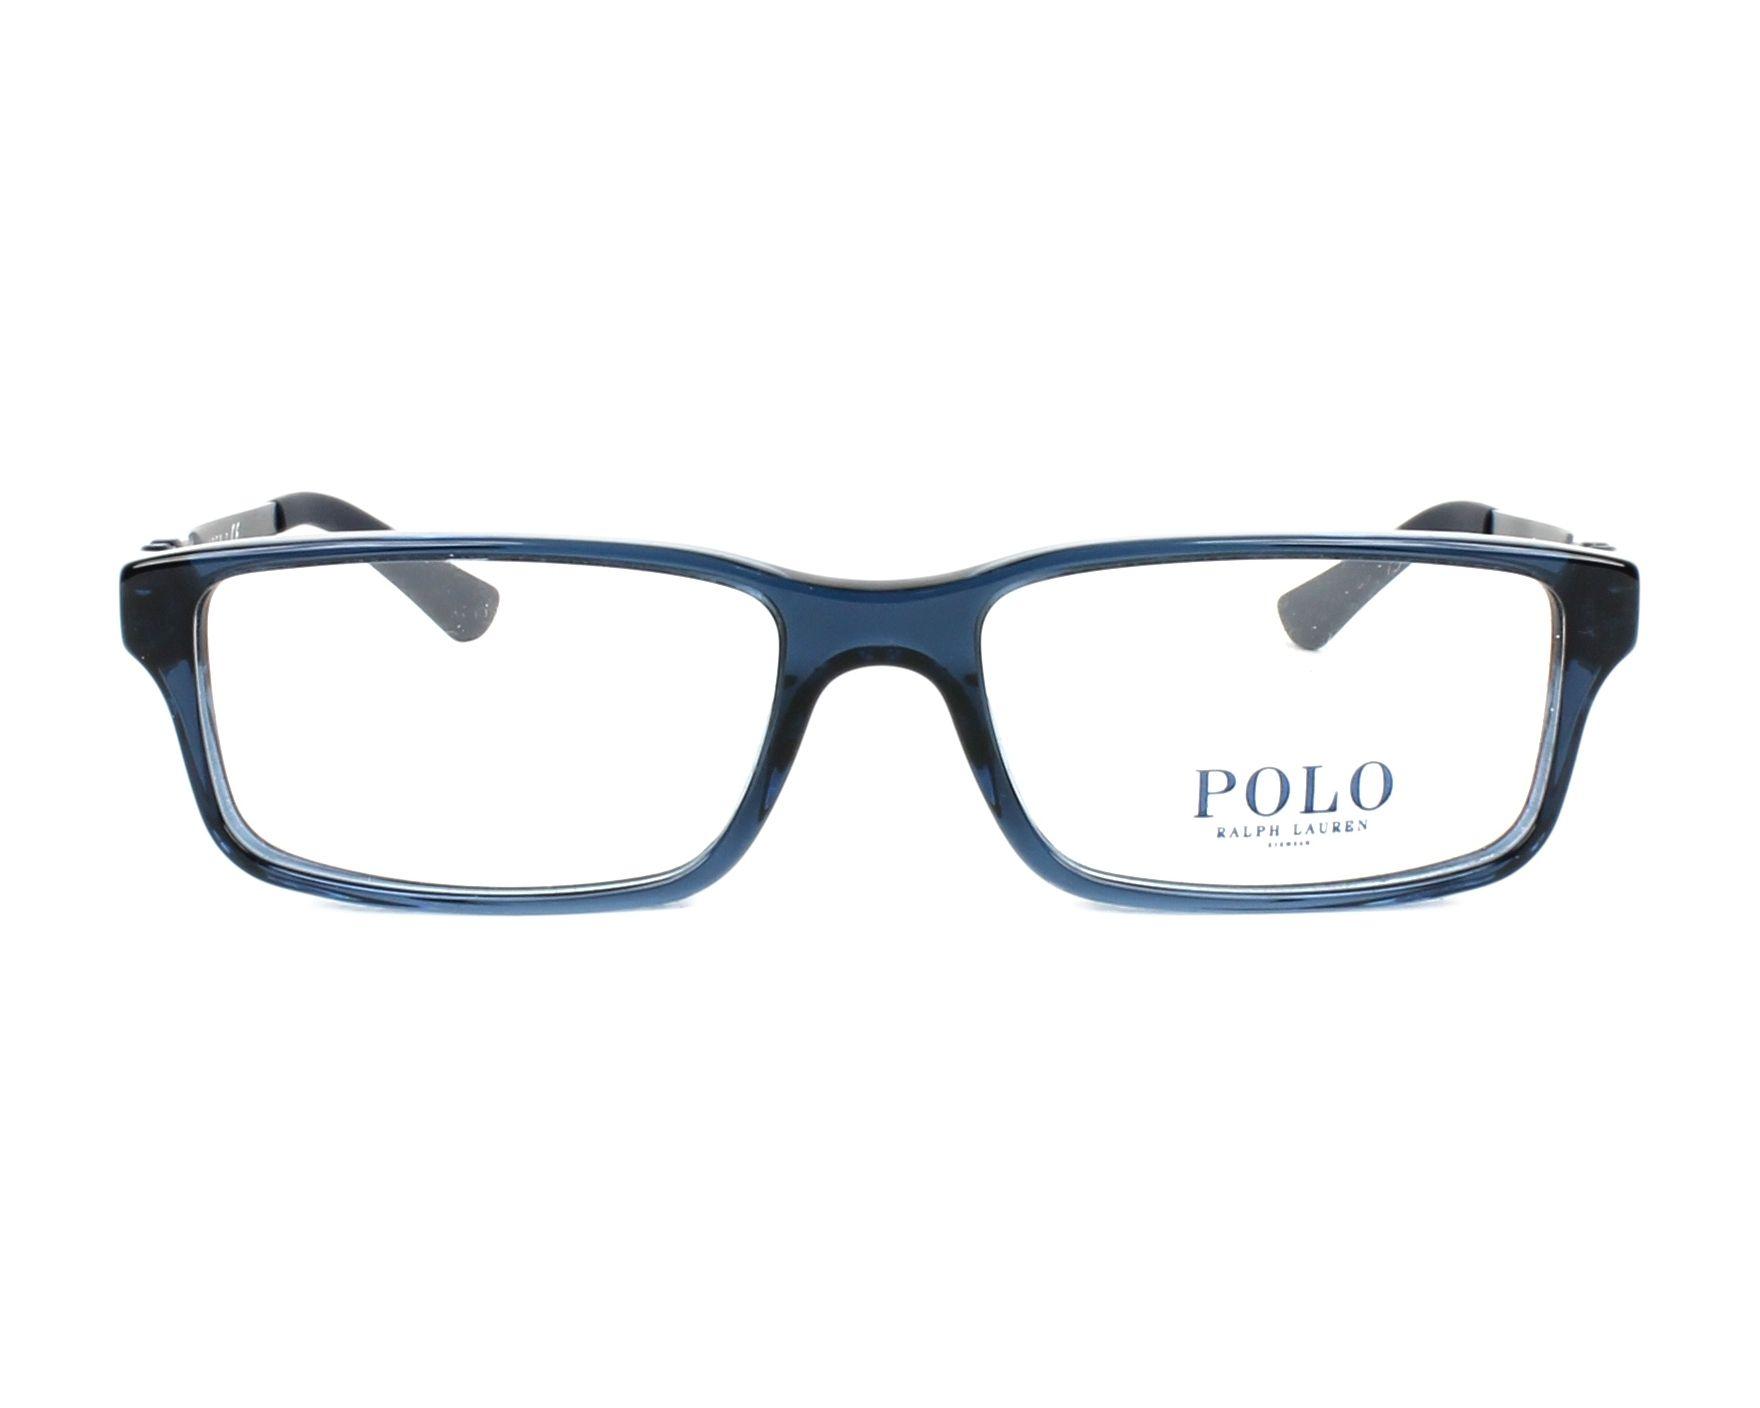 Polo Ralph Lauren PH 2115 5276